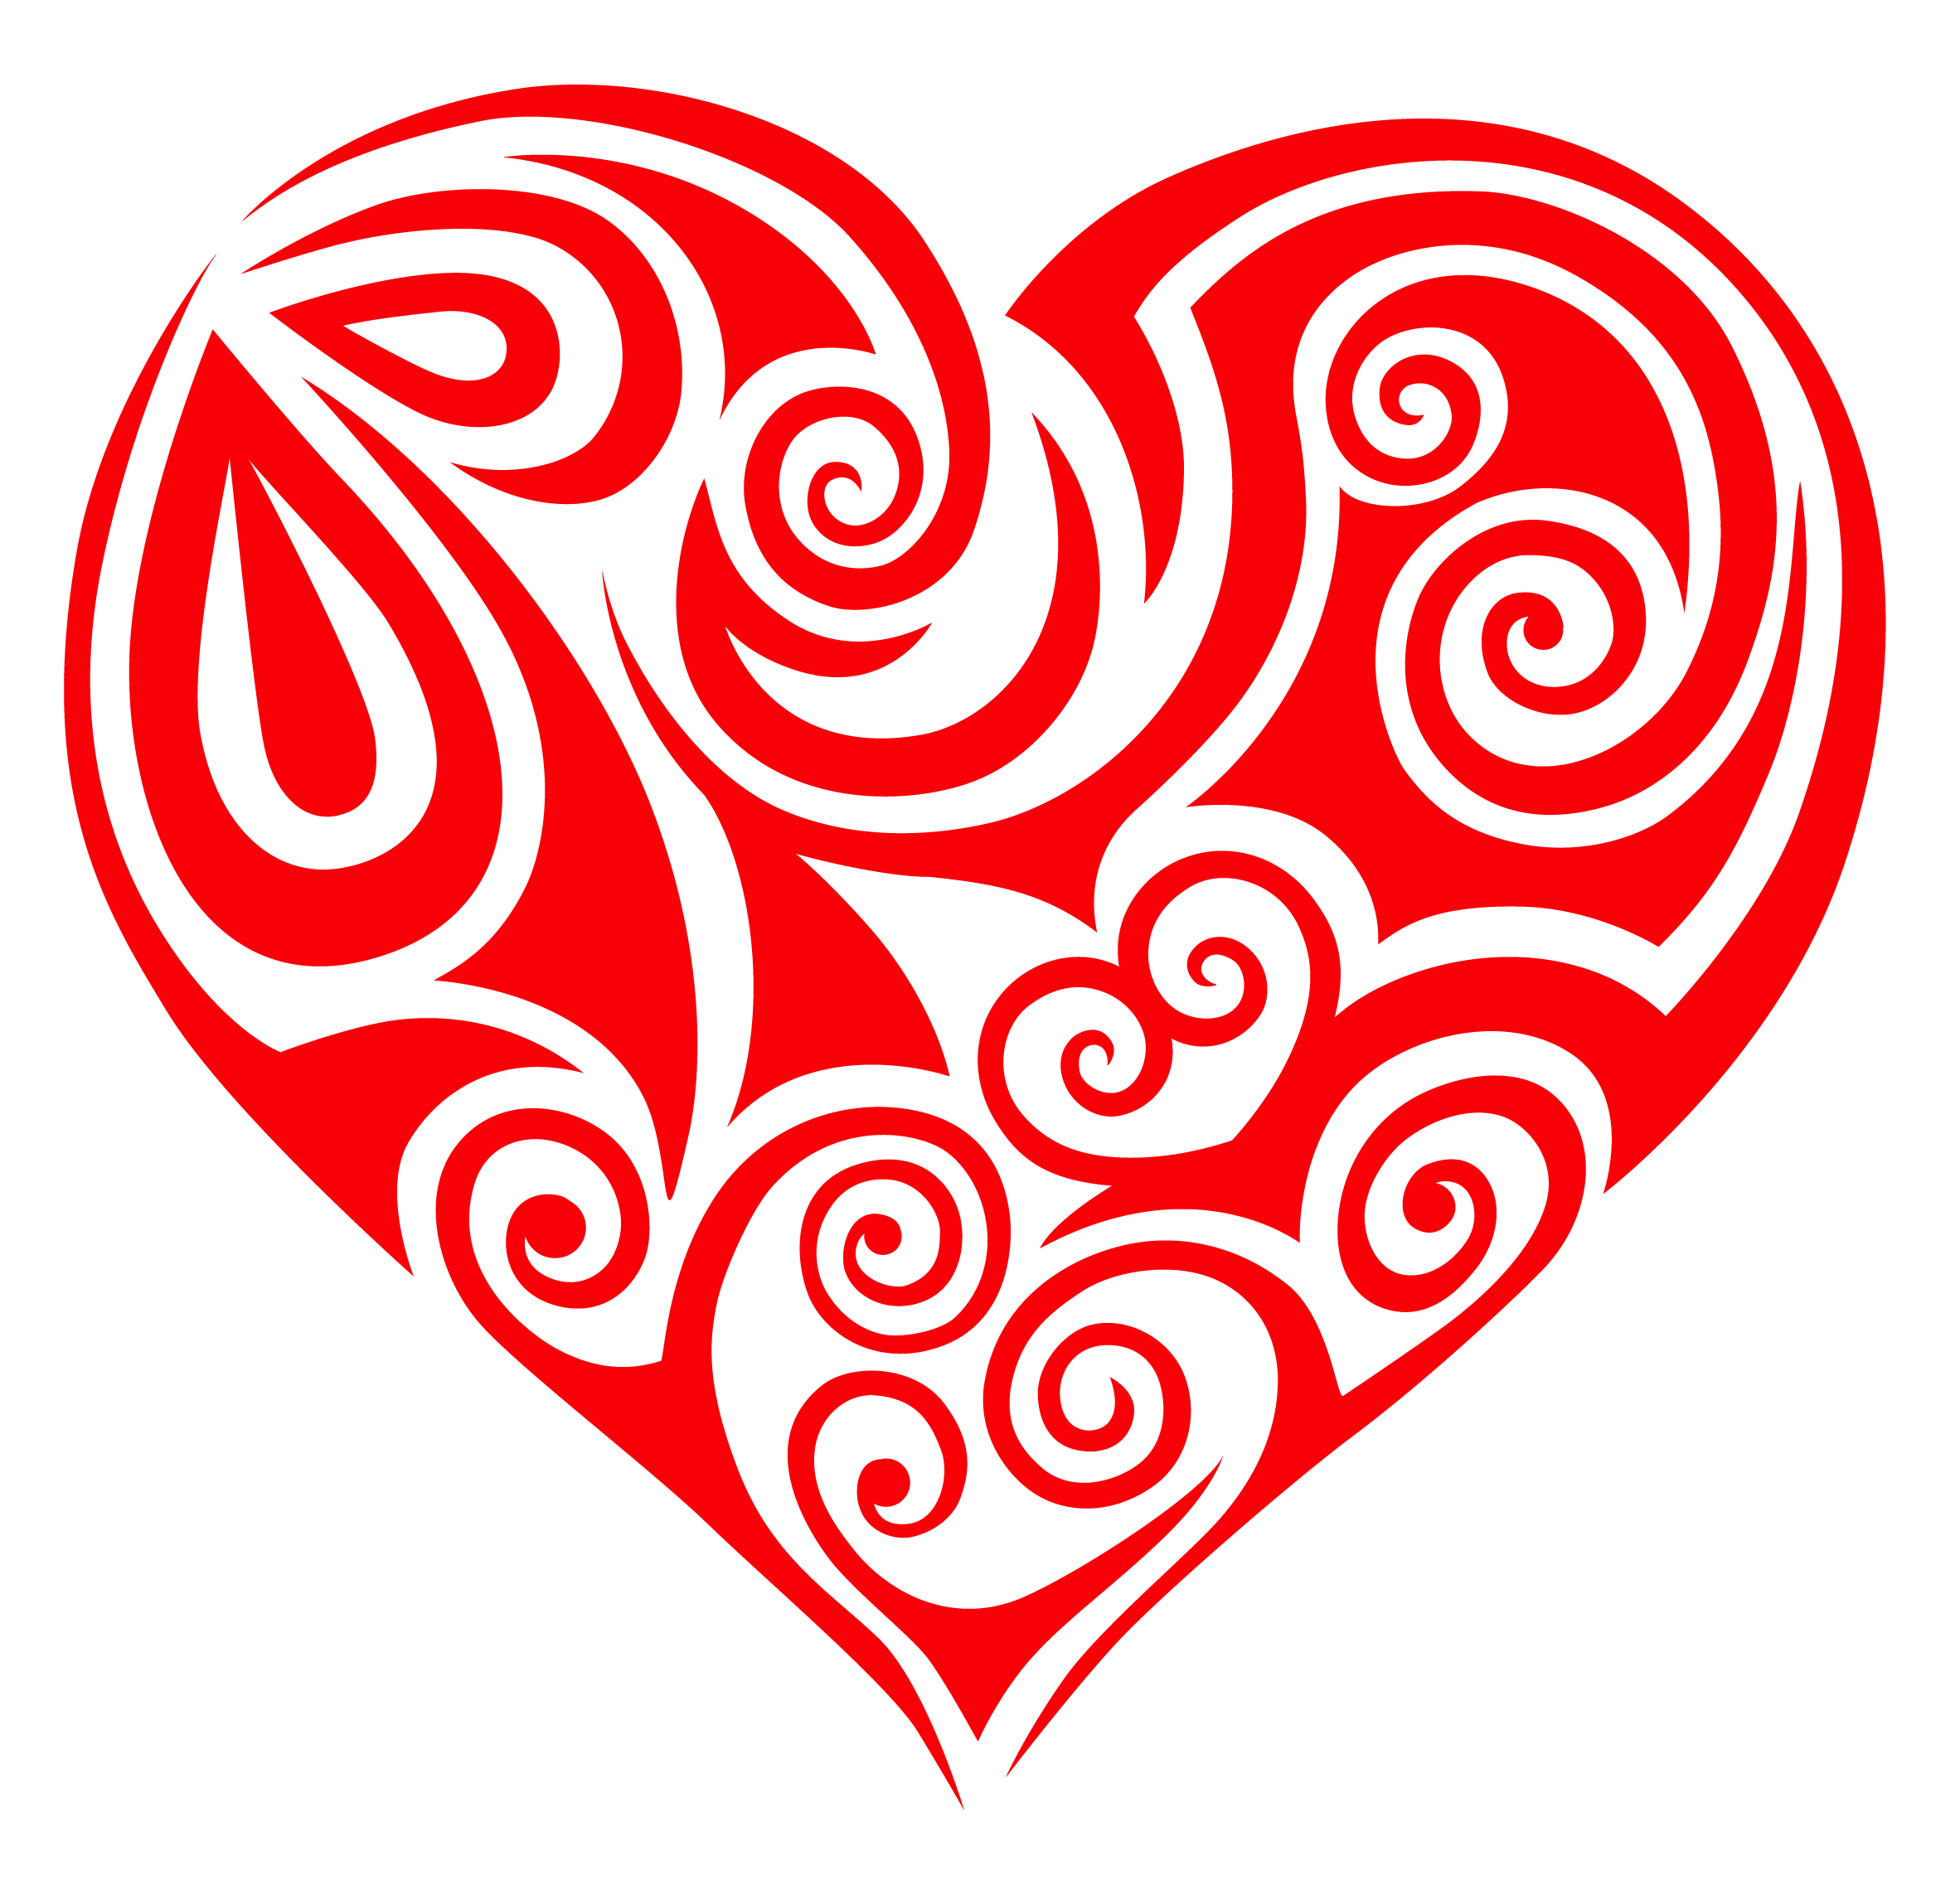 Transparent Ornament Heart PNG Clipart Çizim, Kalp, Resim